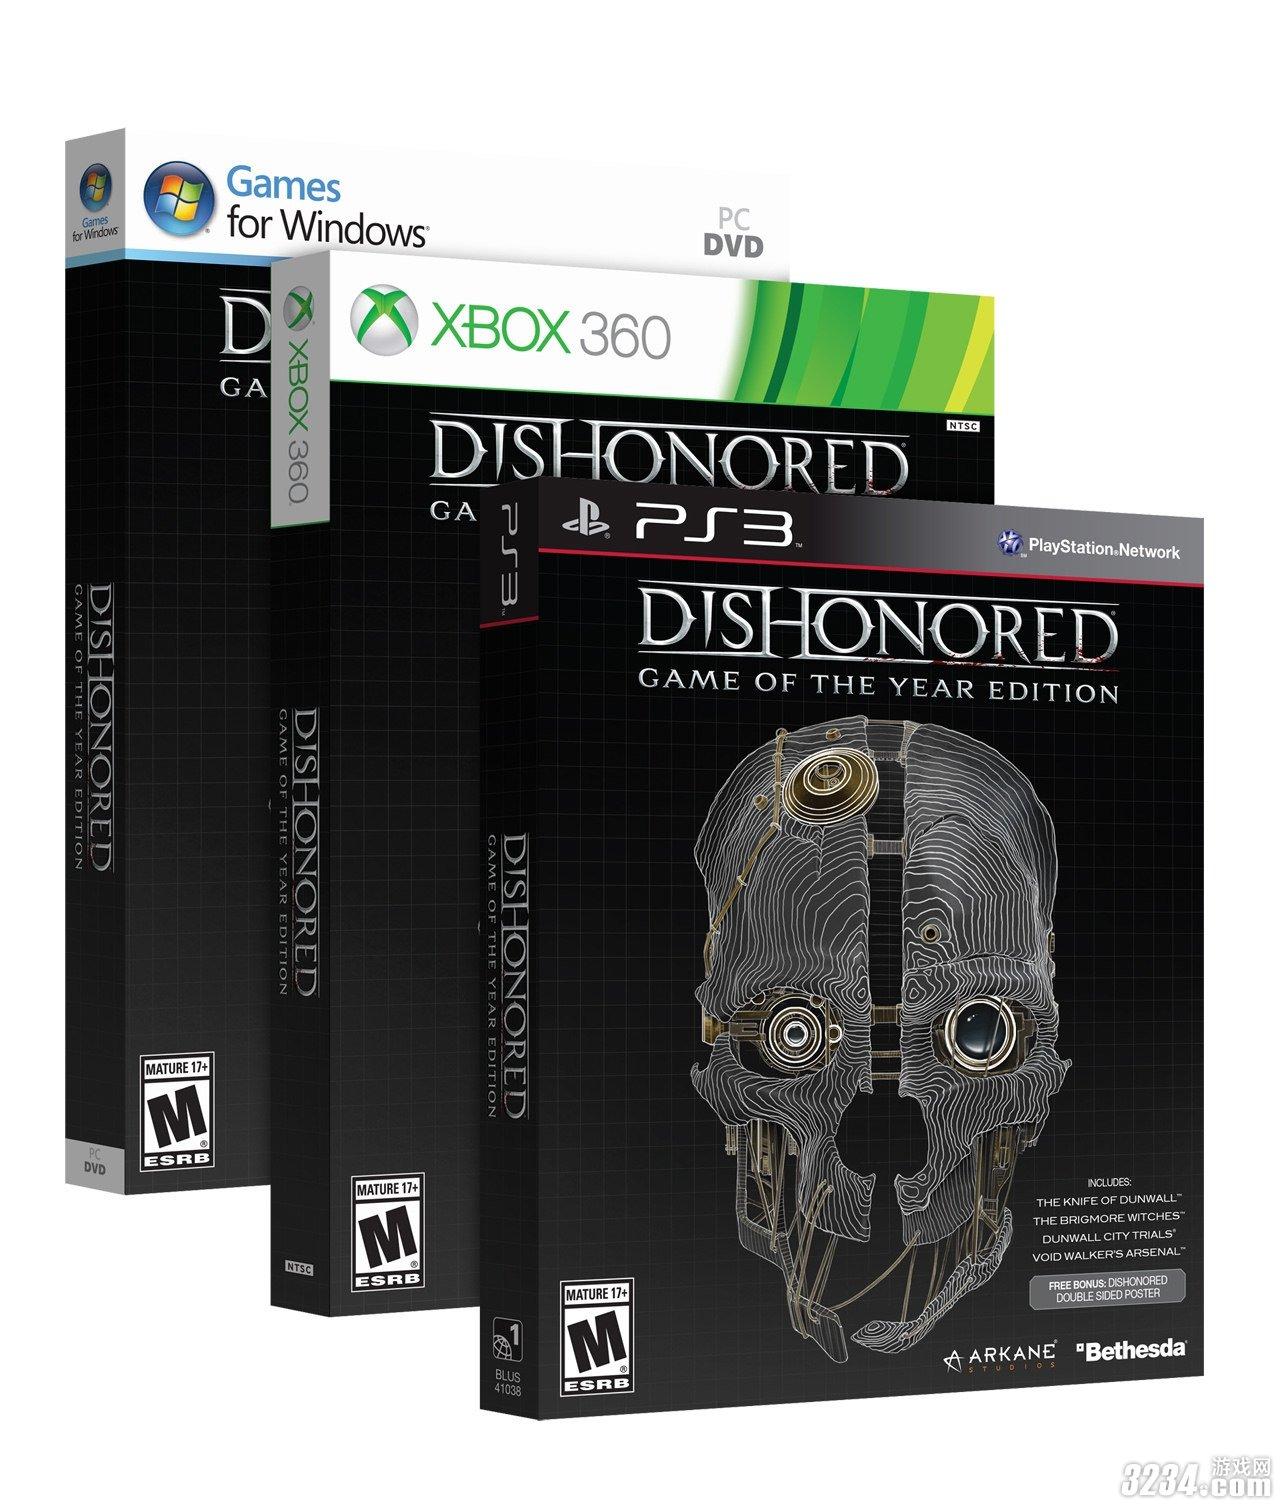 Бокс-арт GOTY издания Dishonored  - Изображение 1